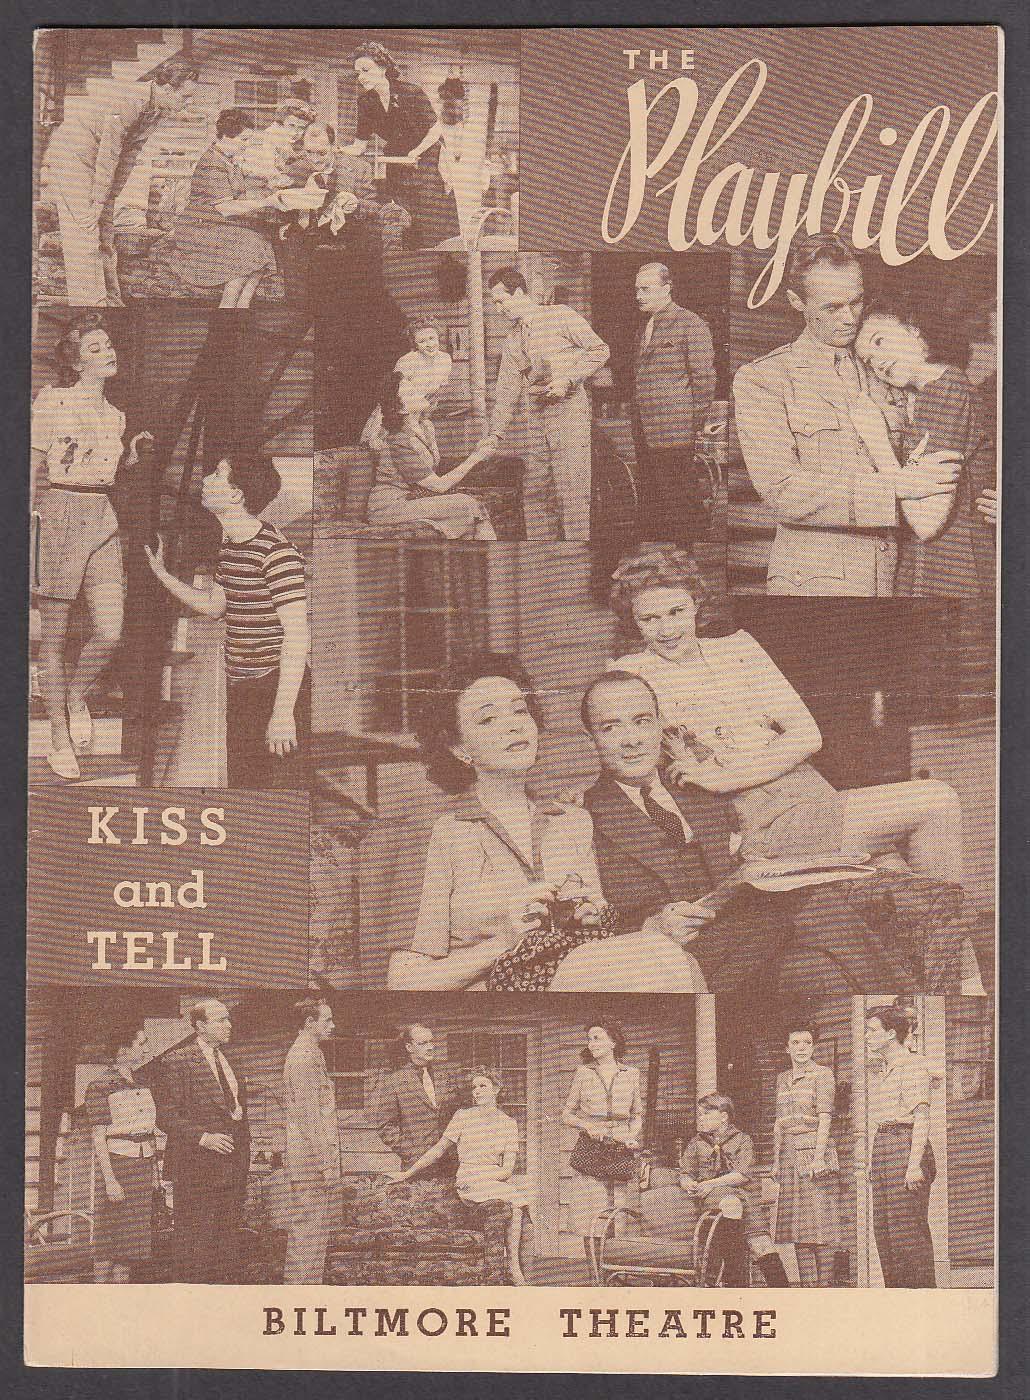 Joan Caulfield Kiss & Tell 1st run Playbill 1943